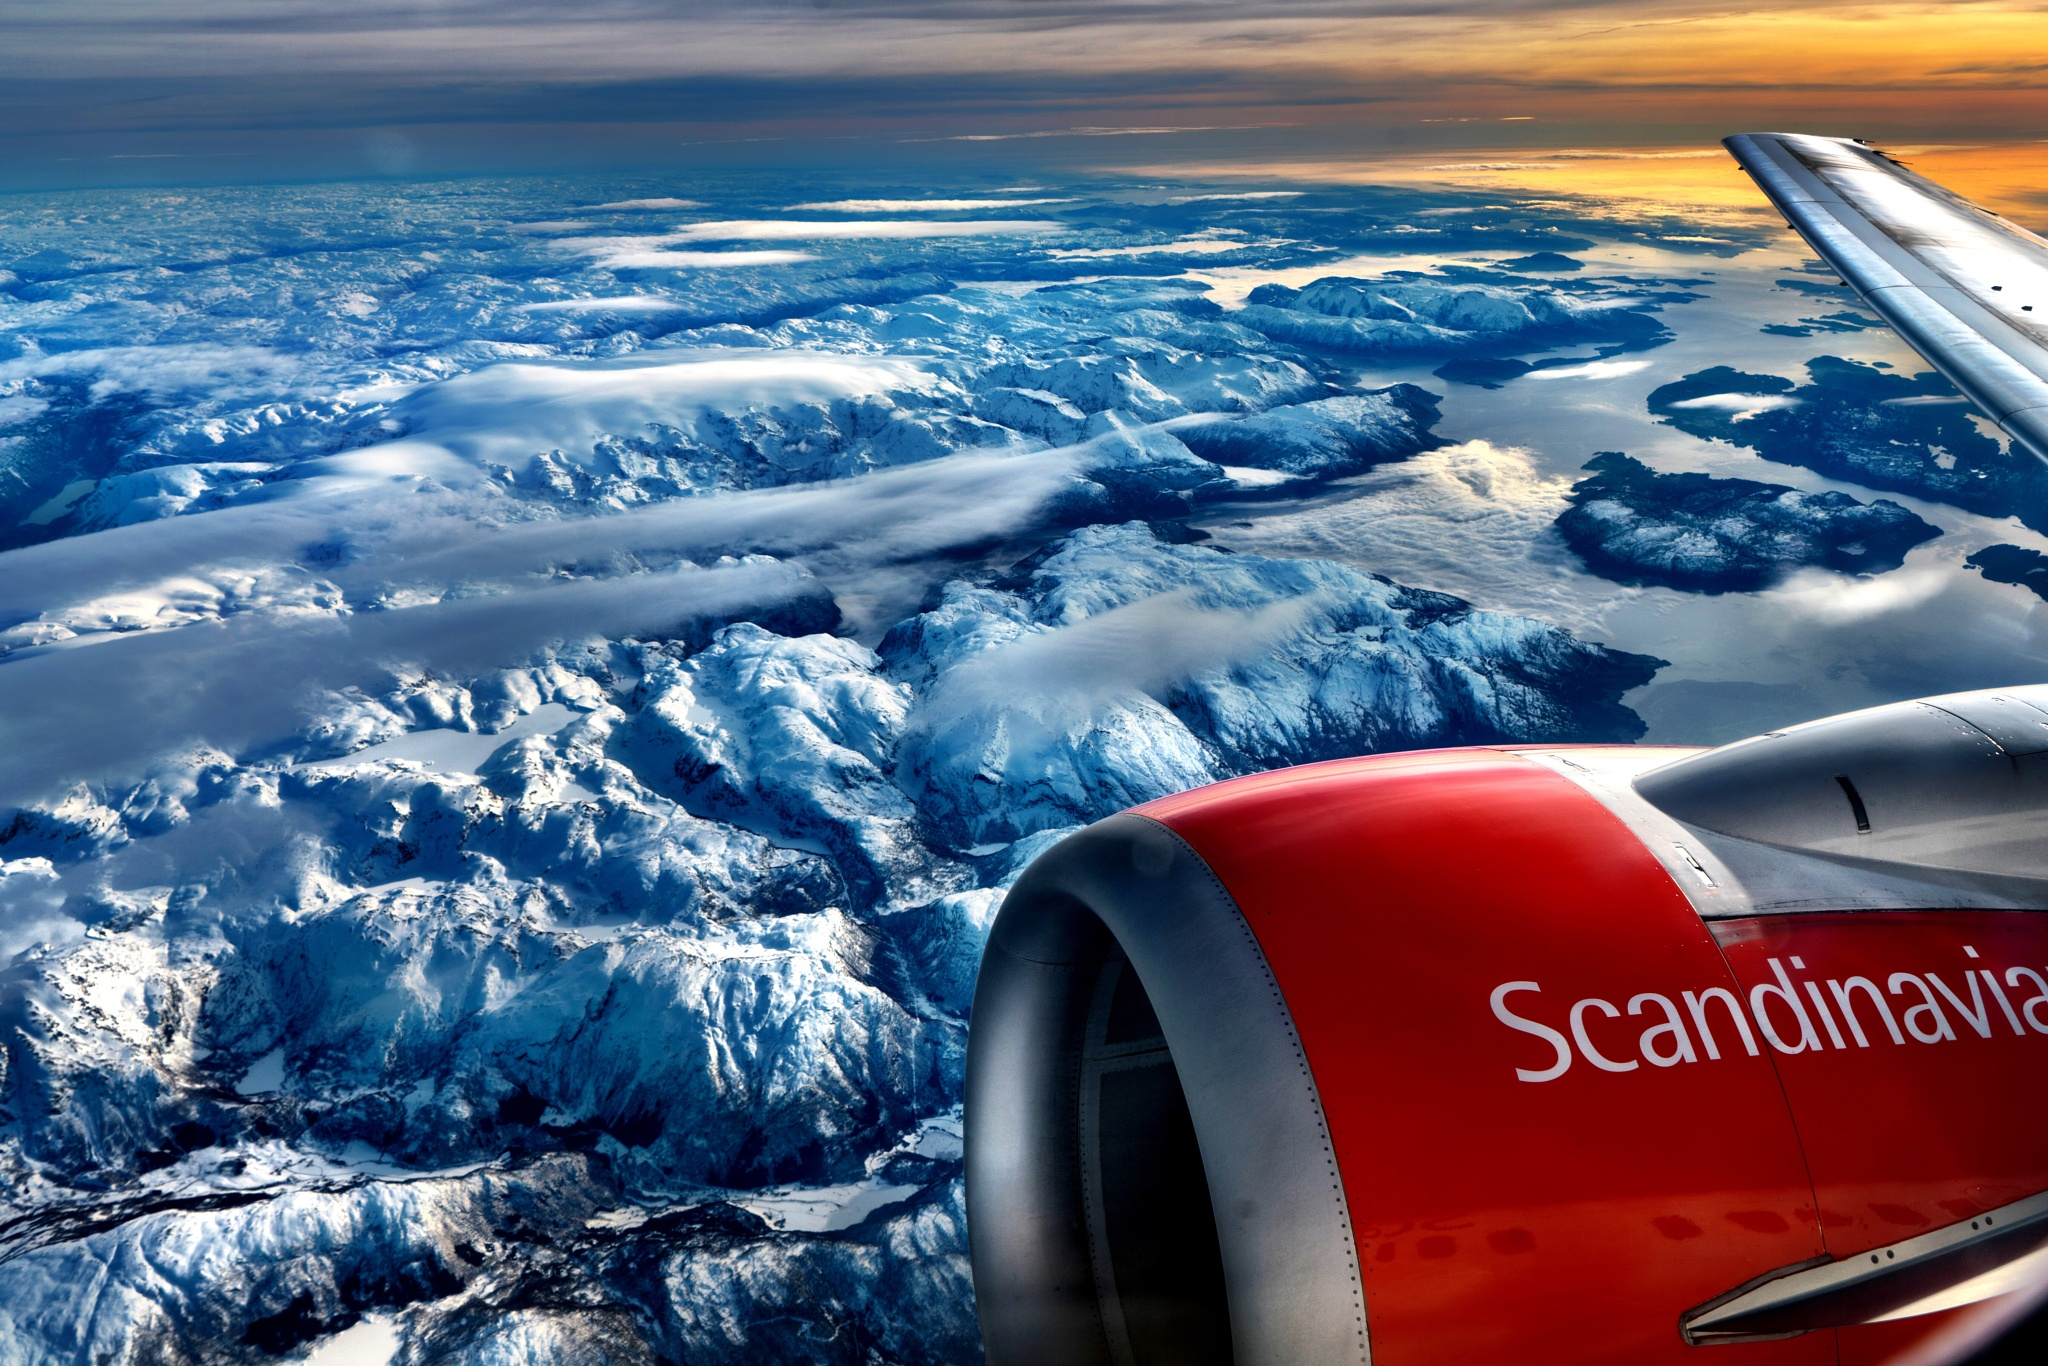 Norwegian mountains  by Jan-Petter Dahl